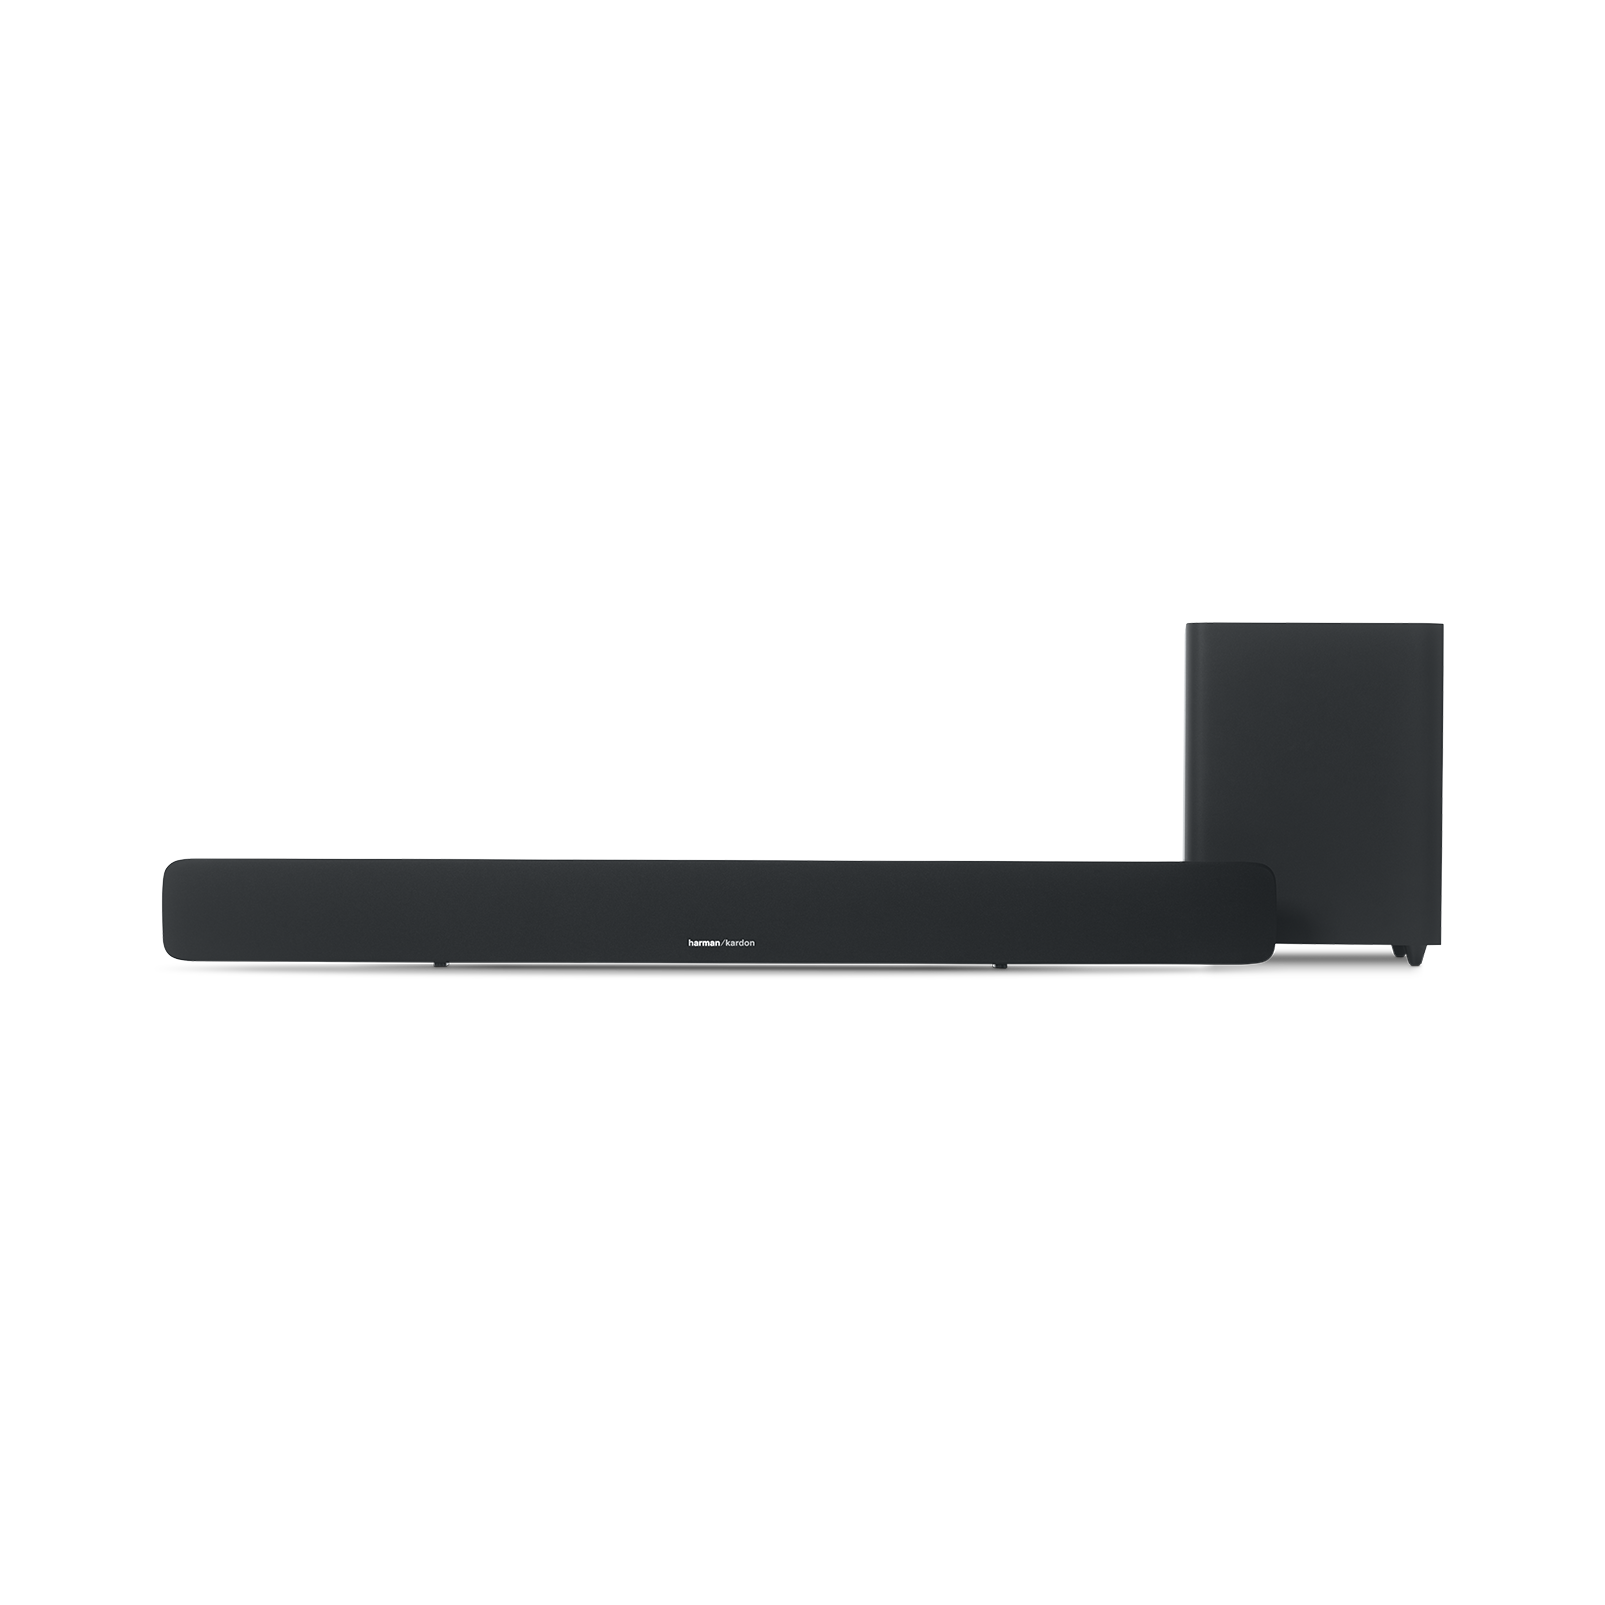 HK SB20 - Black - Advanced soundbar with Bluetooth and powerful wireless subwoofer - Detailshot 1